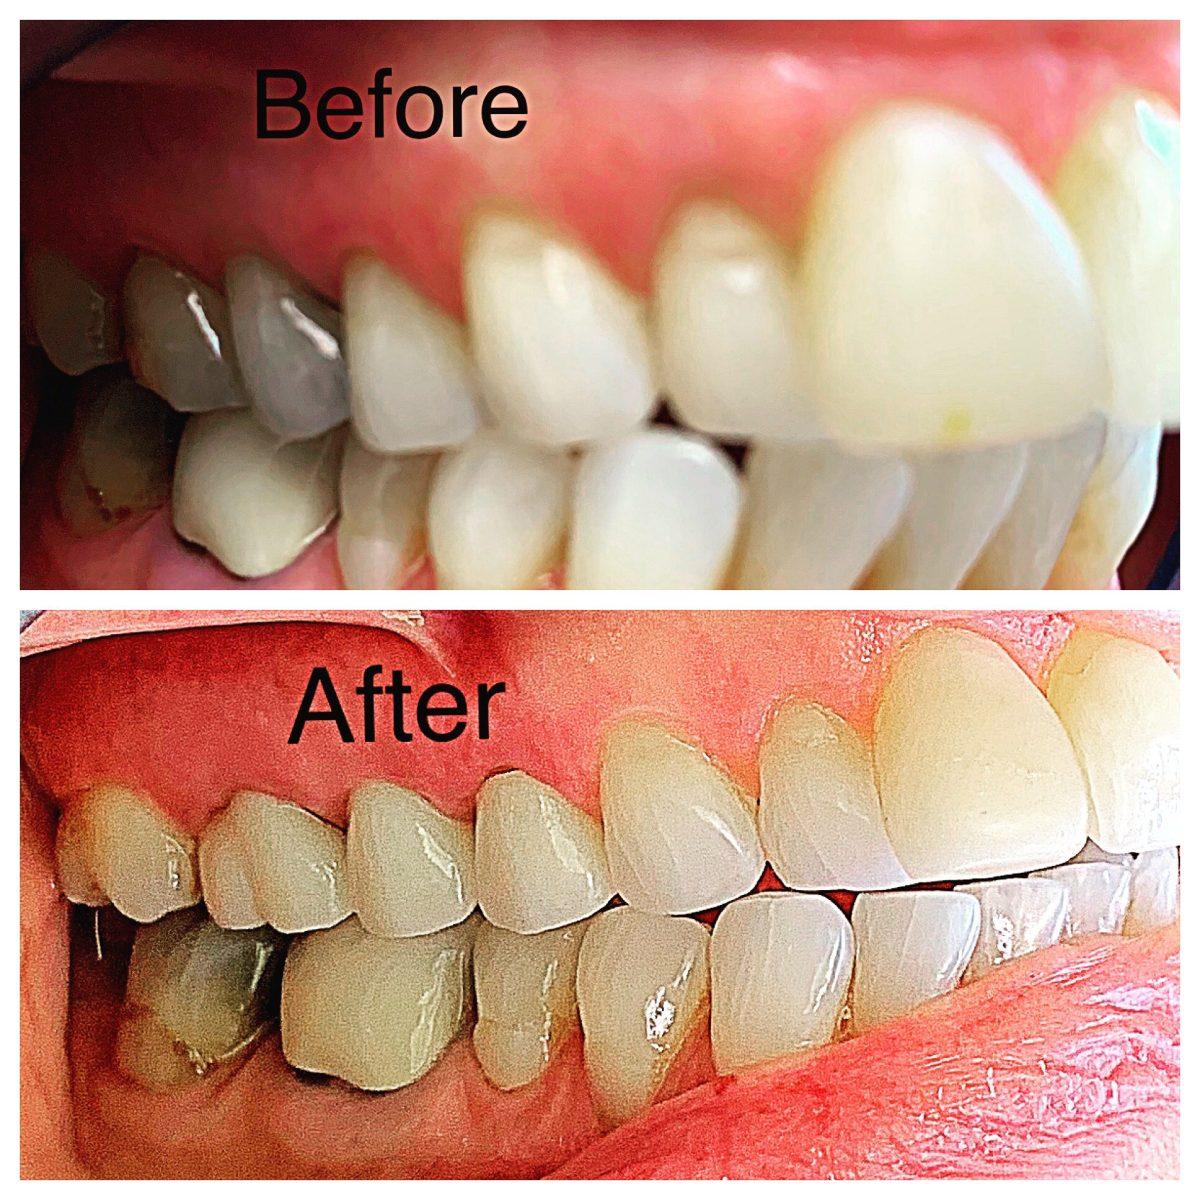 Use of non invasive Porcelain and Bonding one visit dental Appointment by Dr Benjamin Ganjian benganjian nextgenerationdentalnbspNext Generation Dental October